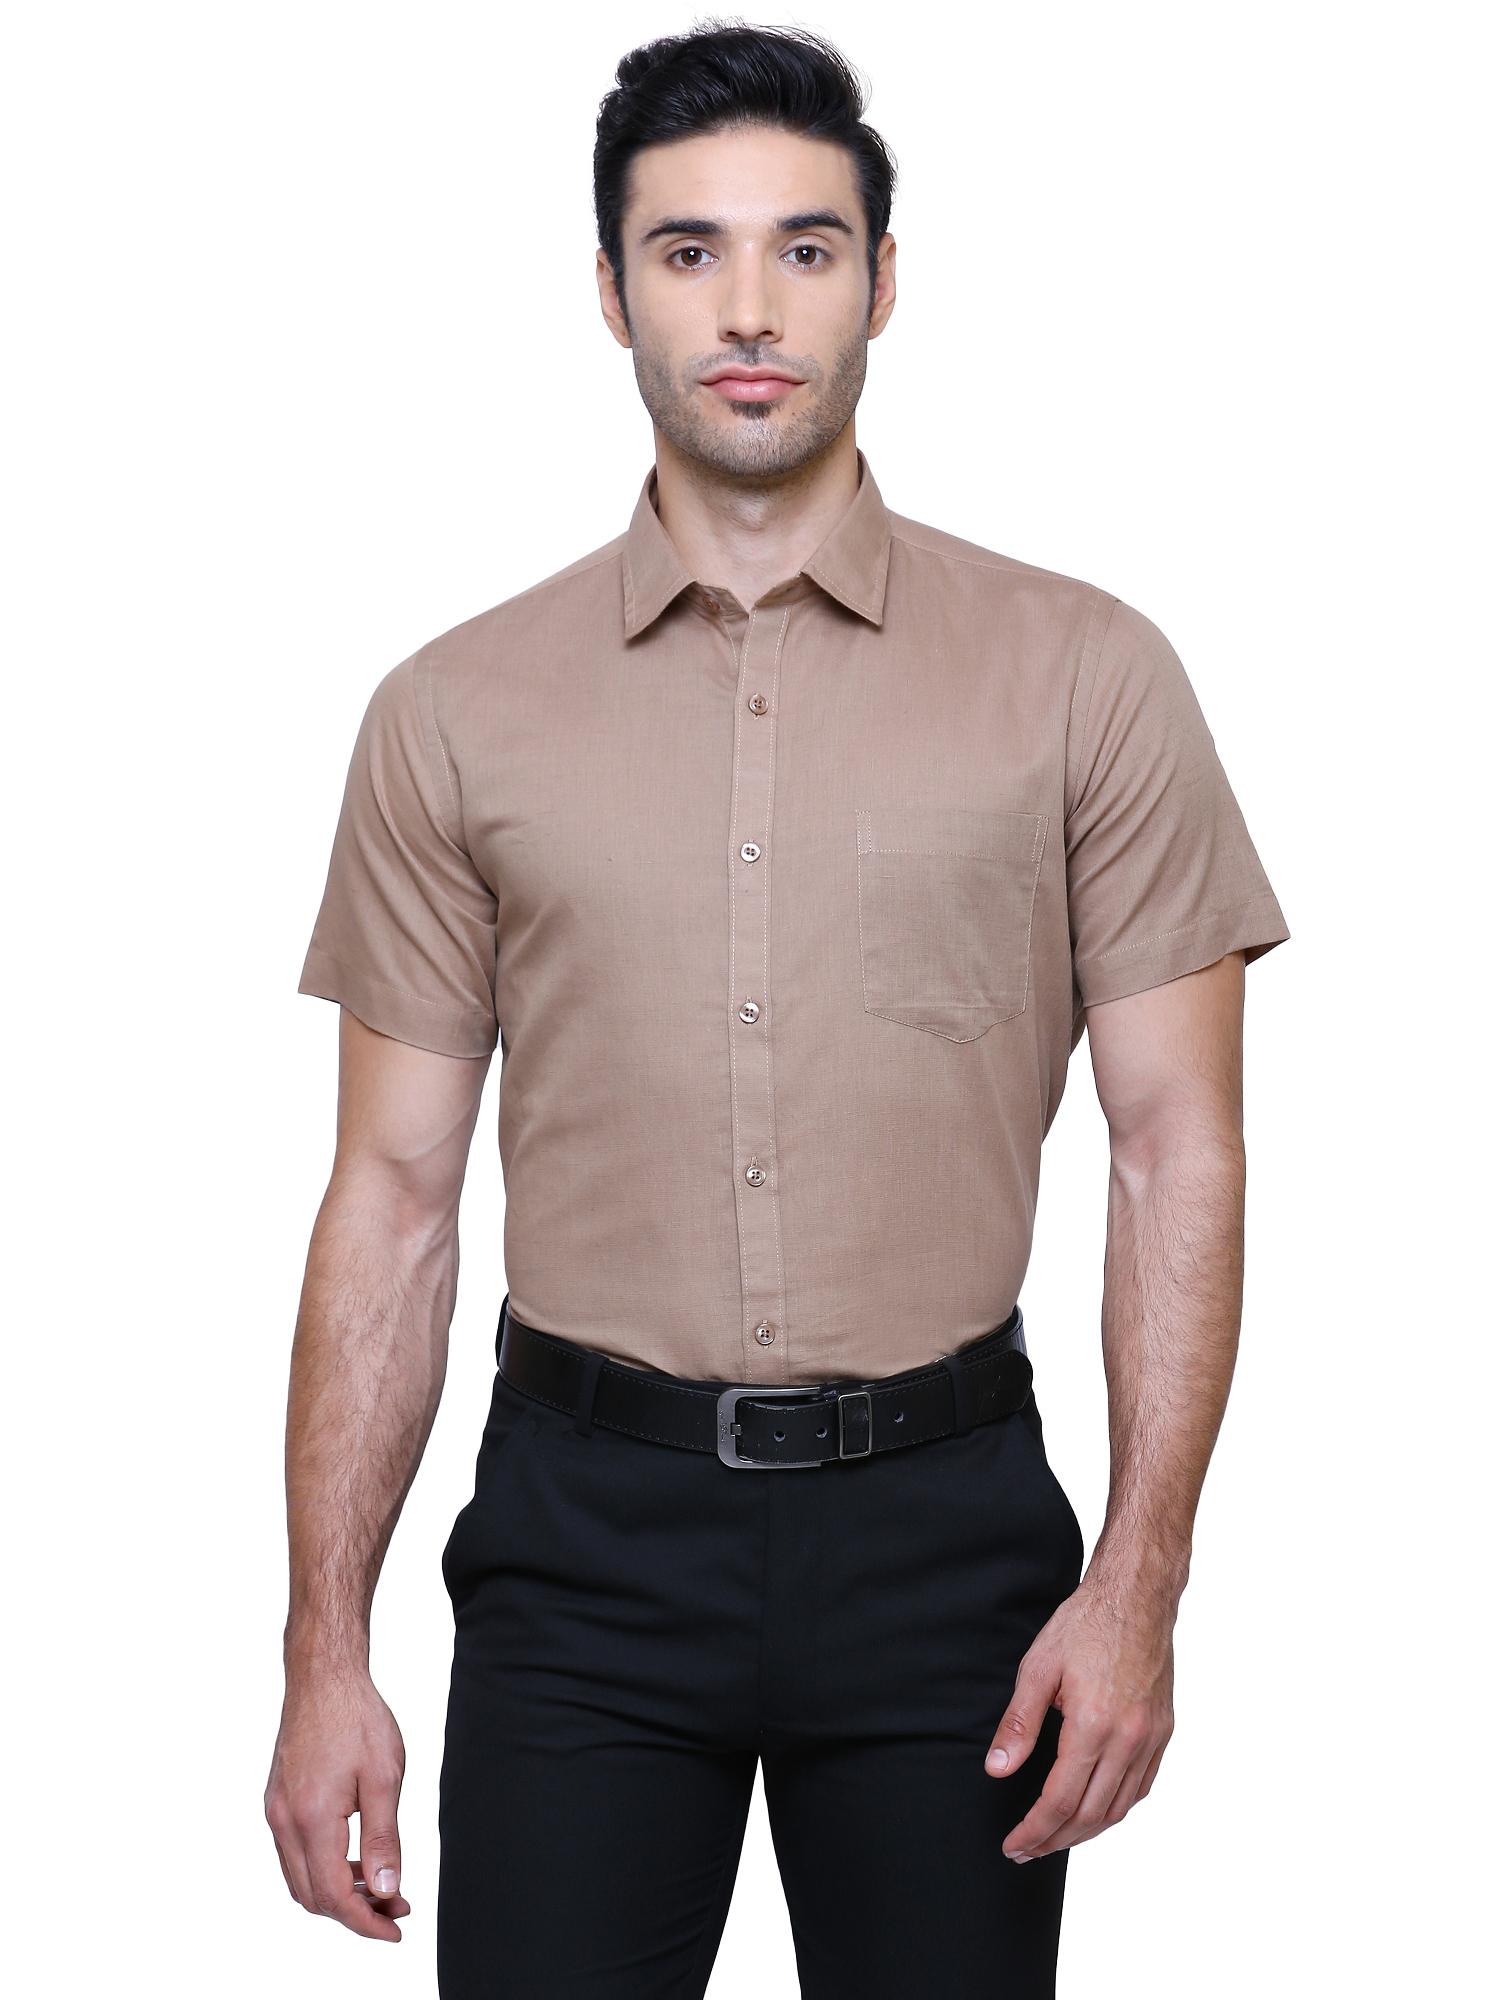 Southbay | Southbay Men's Dark Beige Half Sleeve Linen Cotton Formal Shirt-SBCLHS232BE